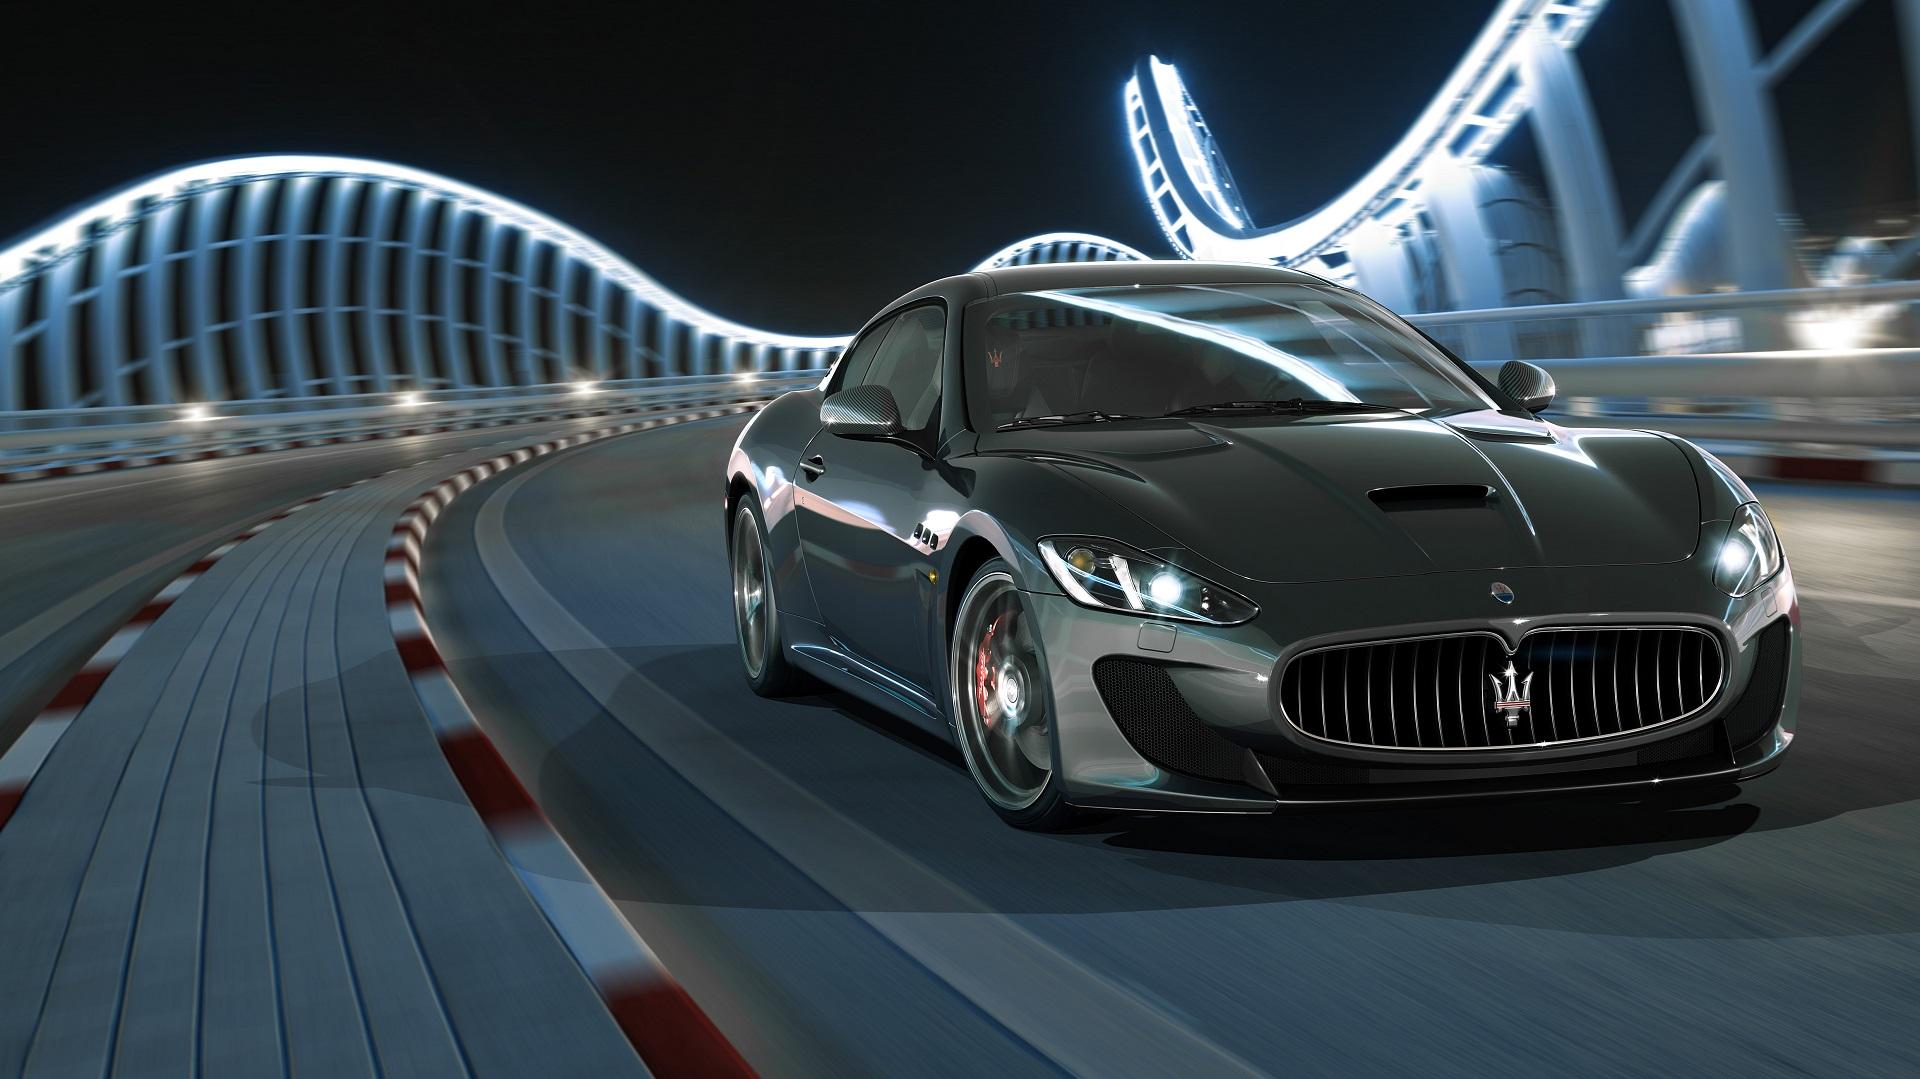 Todos los Maserati serán híbridos o eléctricos a partir de 2019